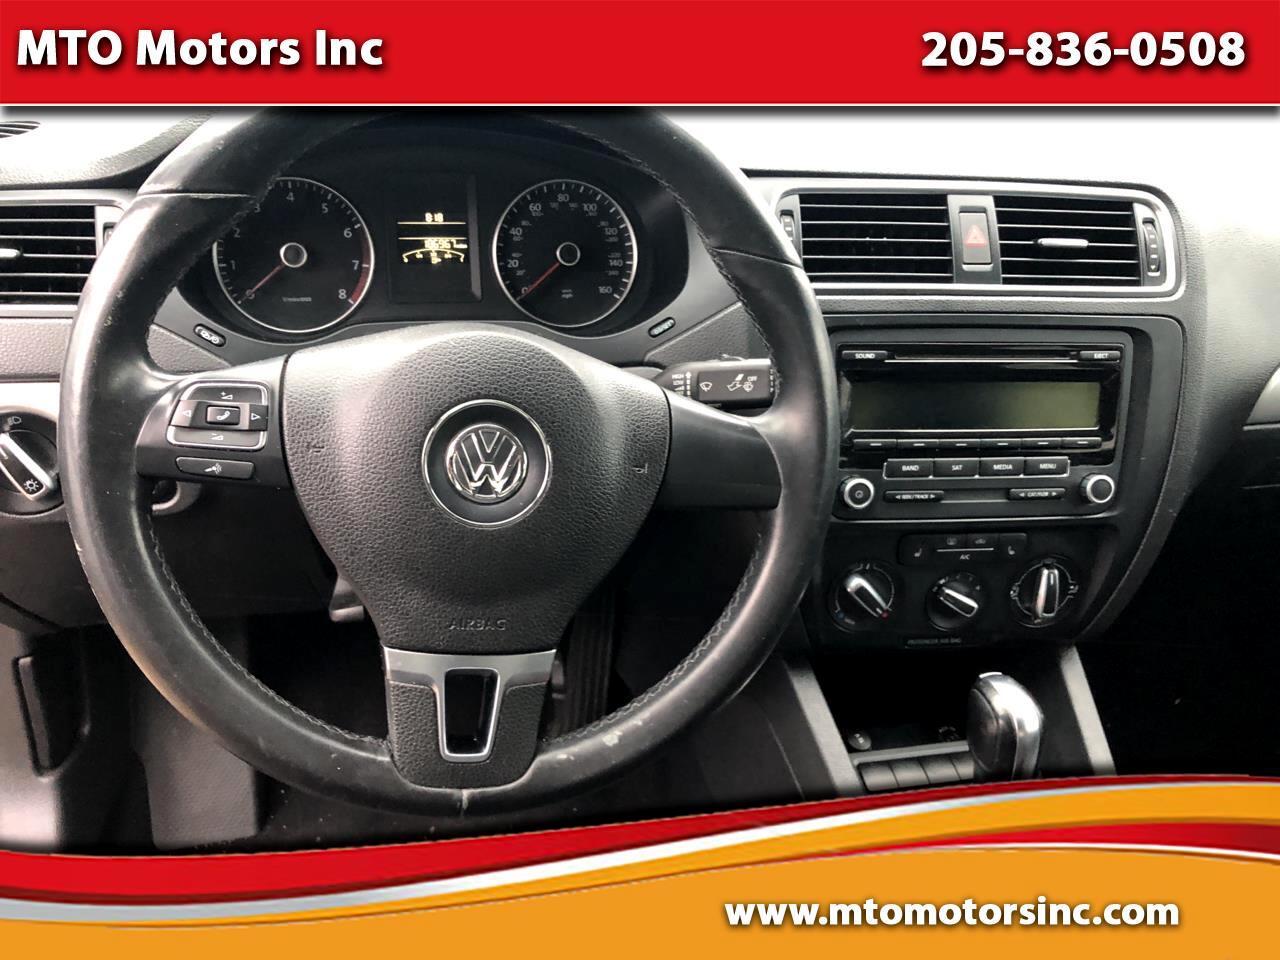 Volkswagen Jetta SE 2013